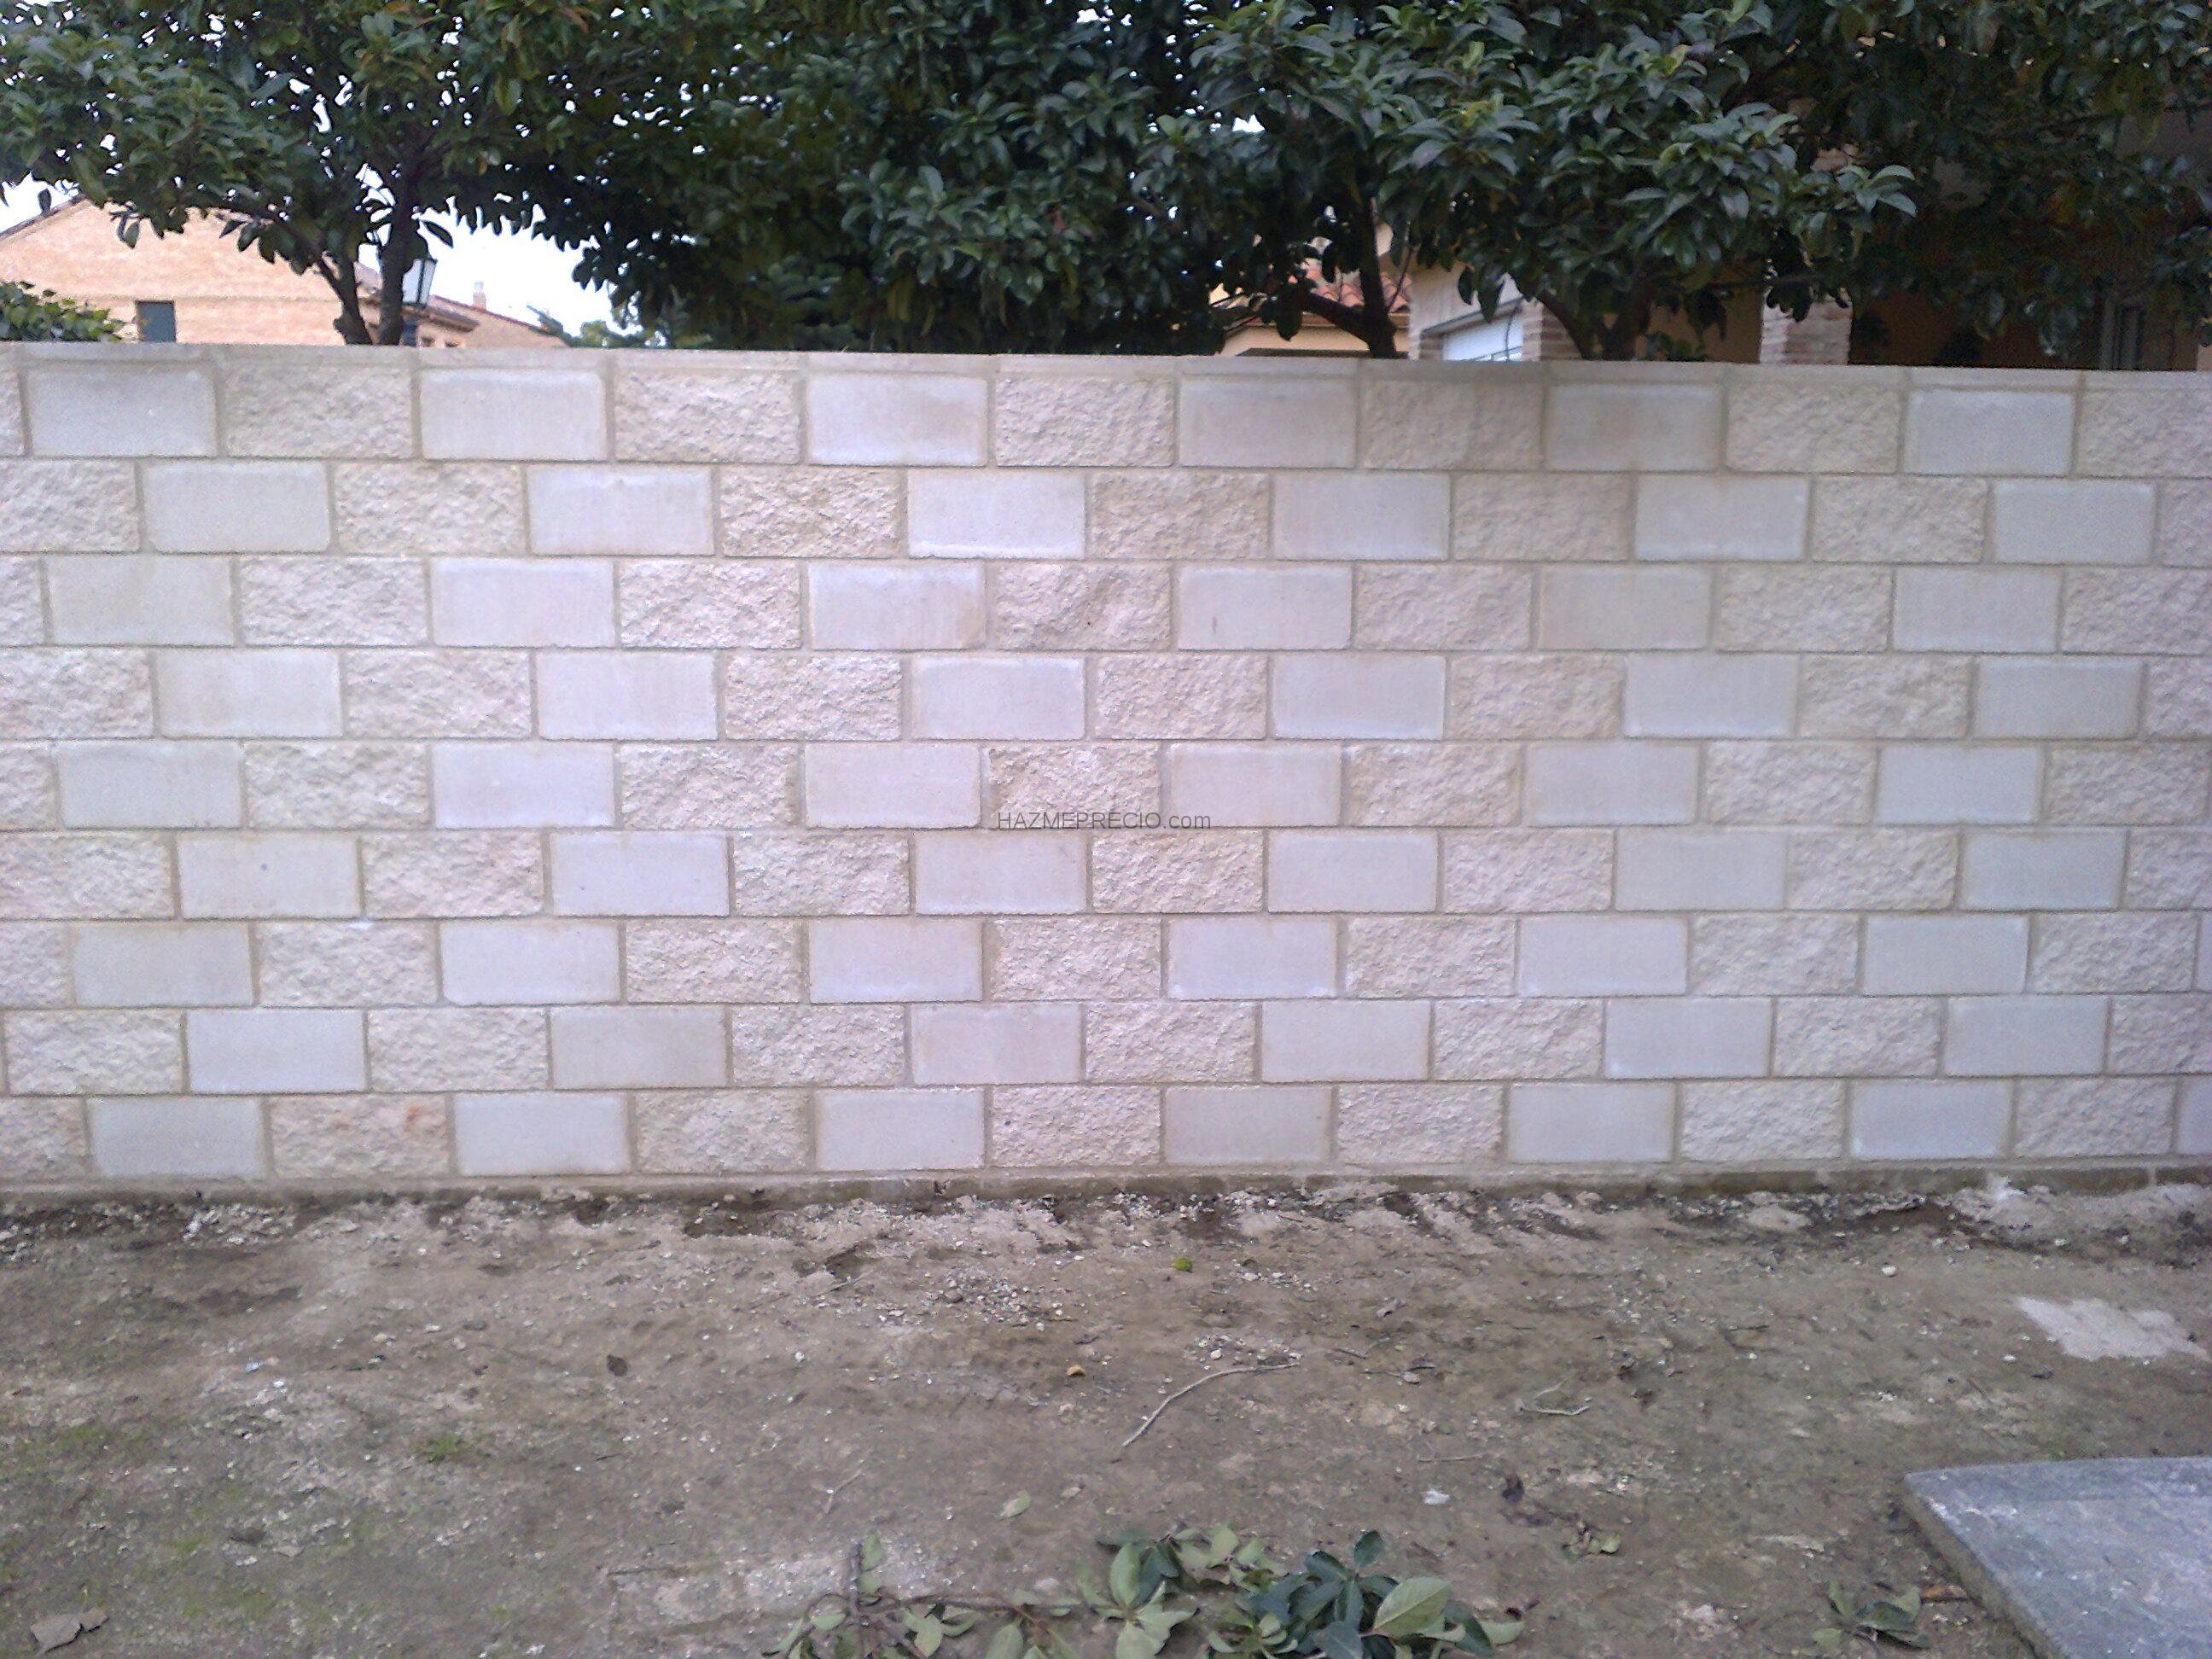 Muros de bloques de cemento hd 1080p 4k foto - Muro de bloques ...